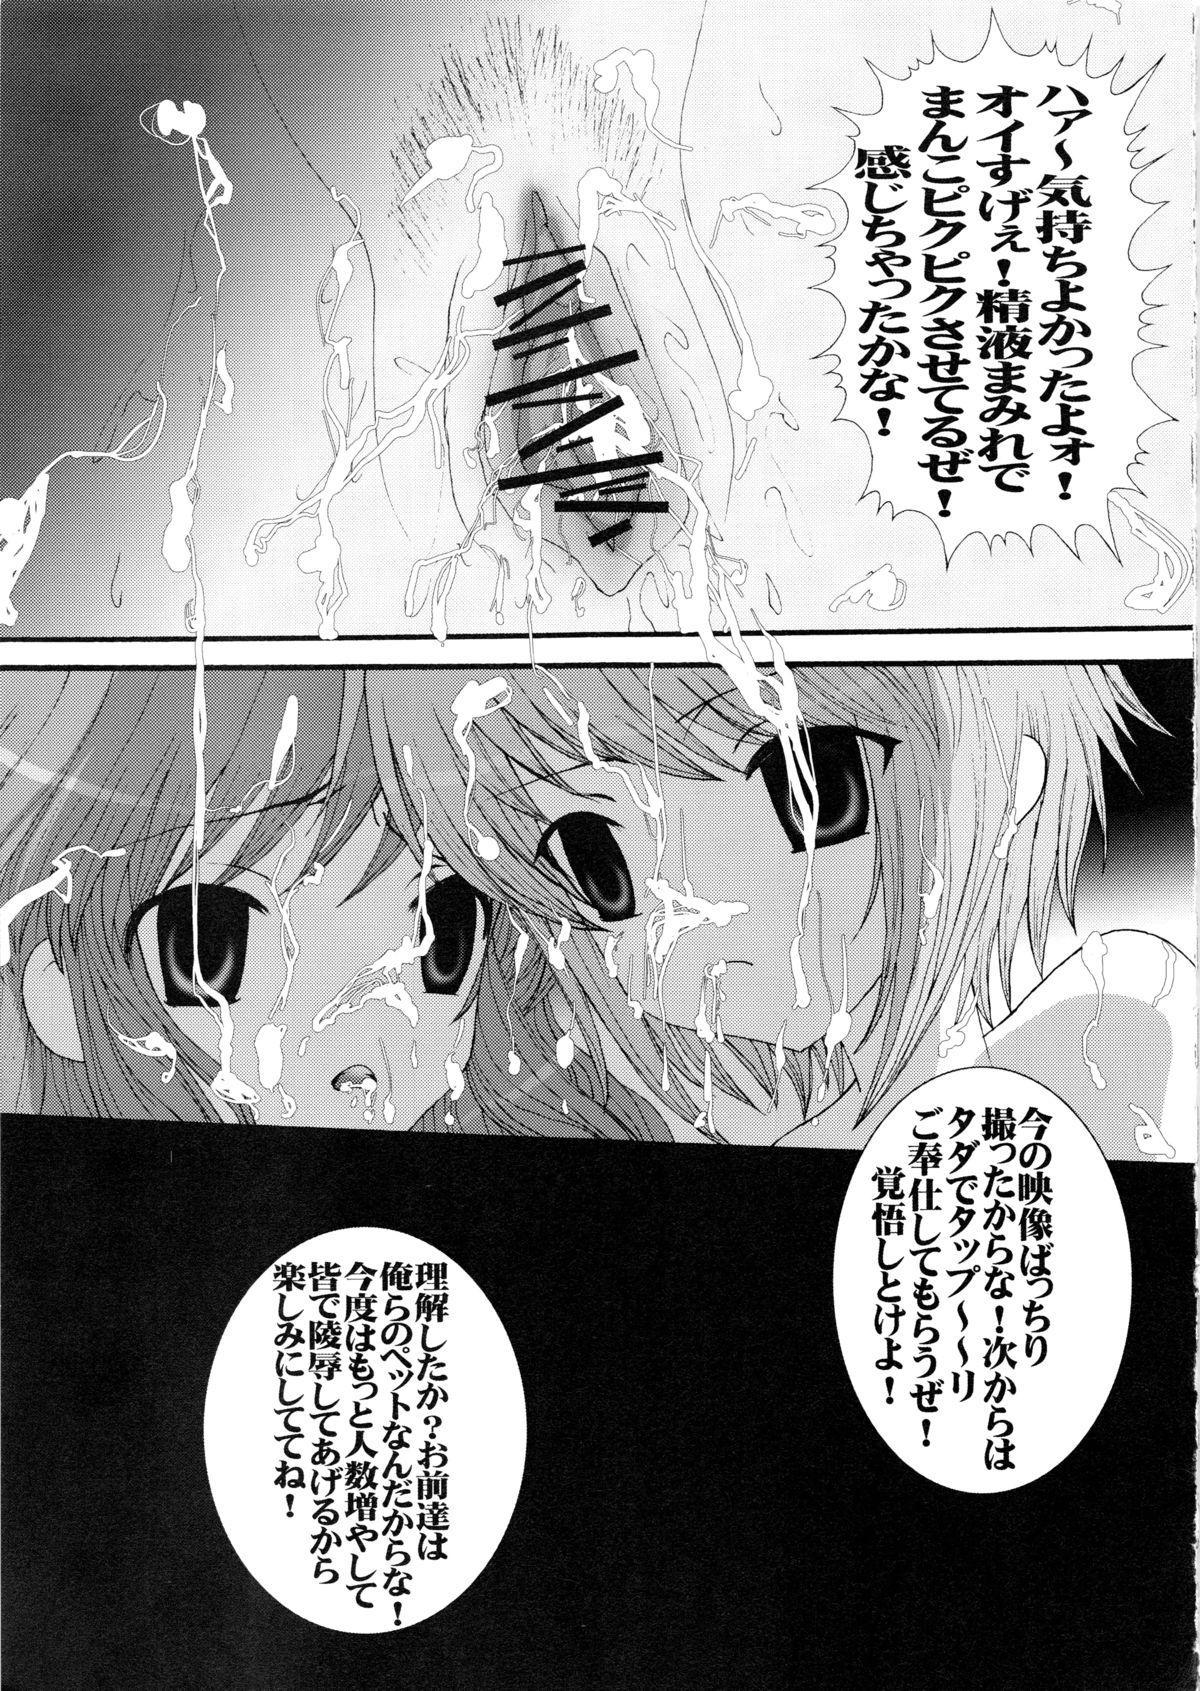 School-mer! School Mizugi Bloomer Joshi Anthology 29